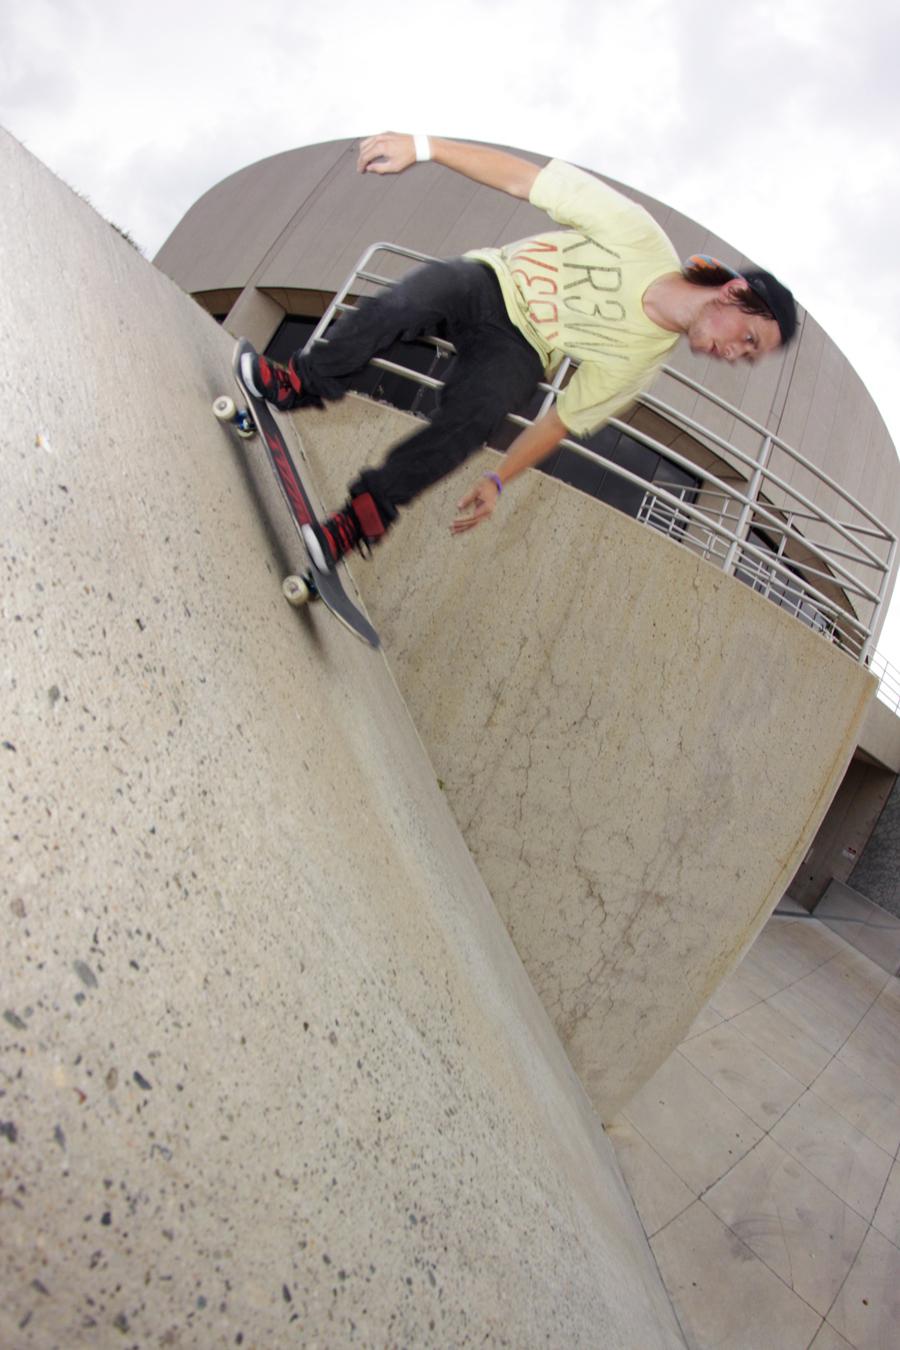 tanner frano reno skateboarding kyle volland